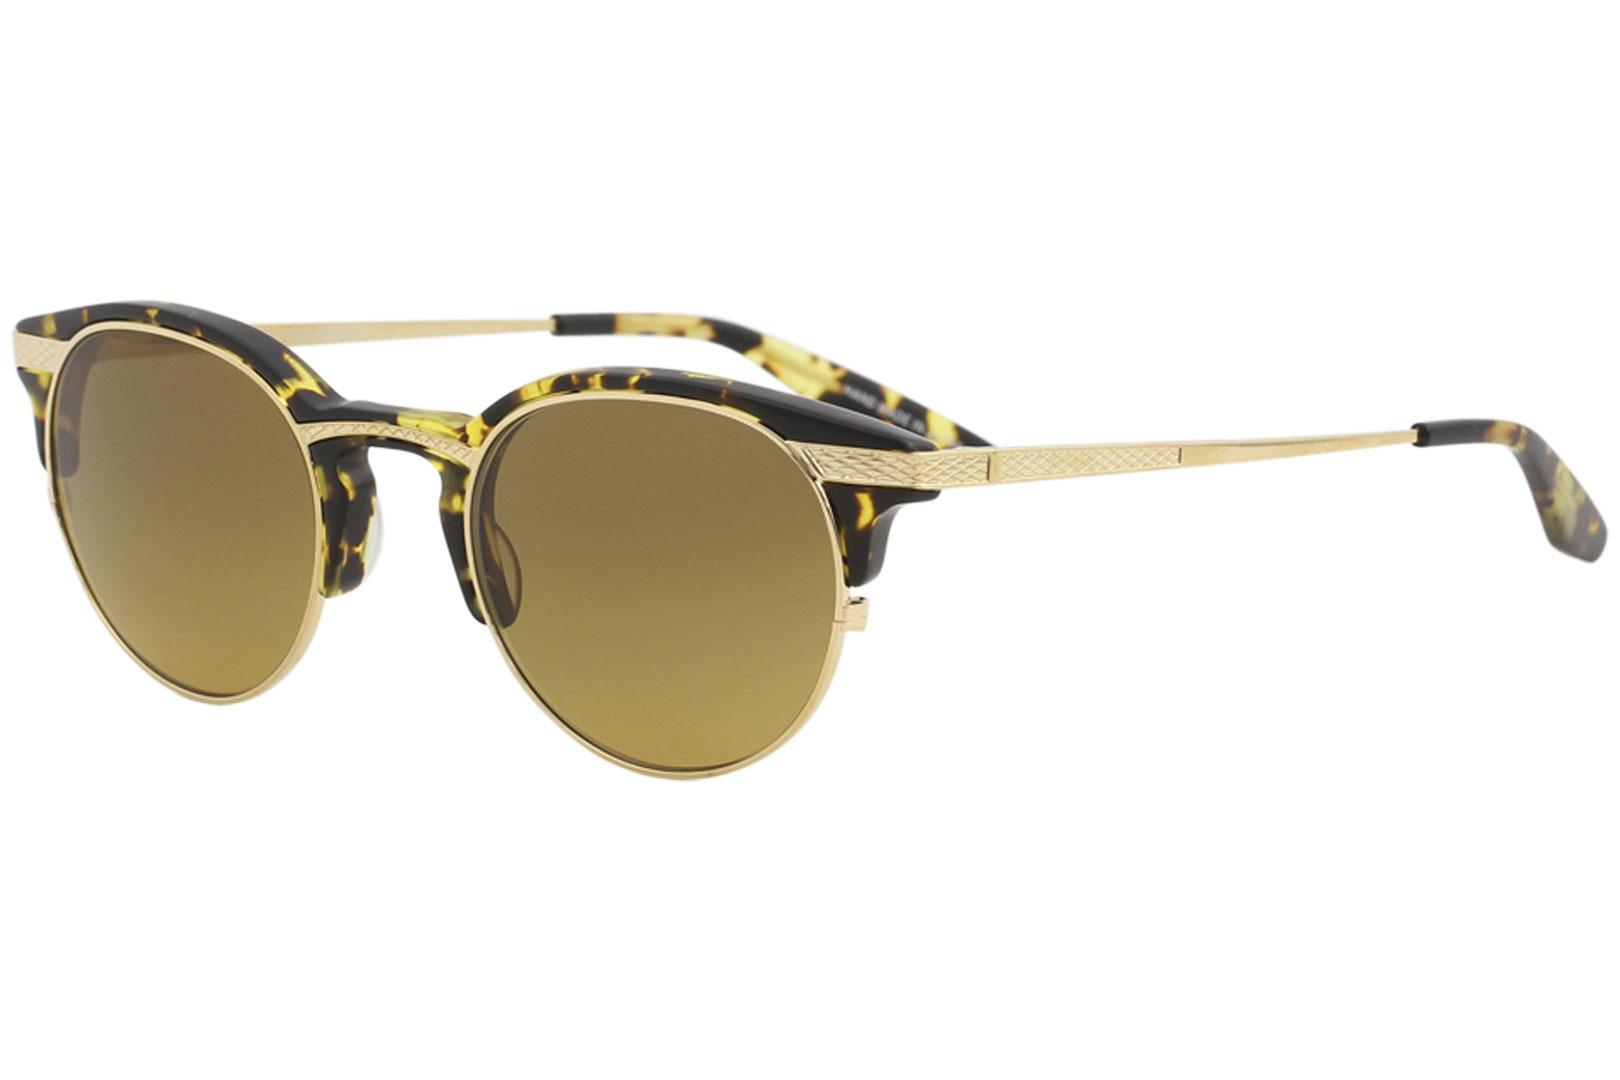 b70229a592 Barton Perreira Women s Roux Fashion Round Sunglasses